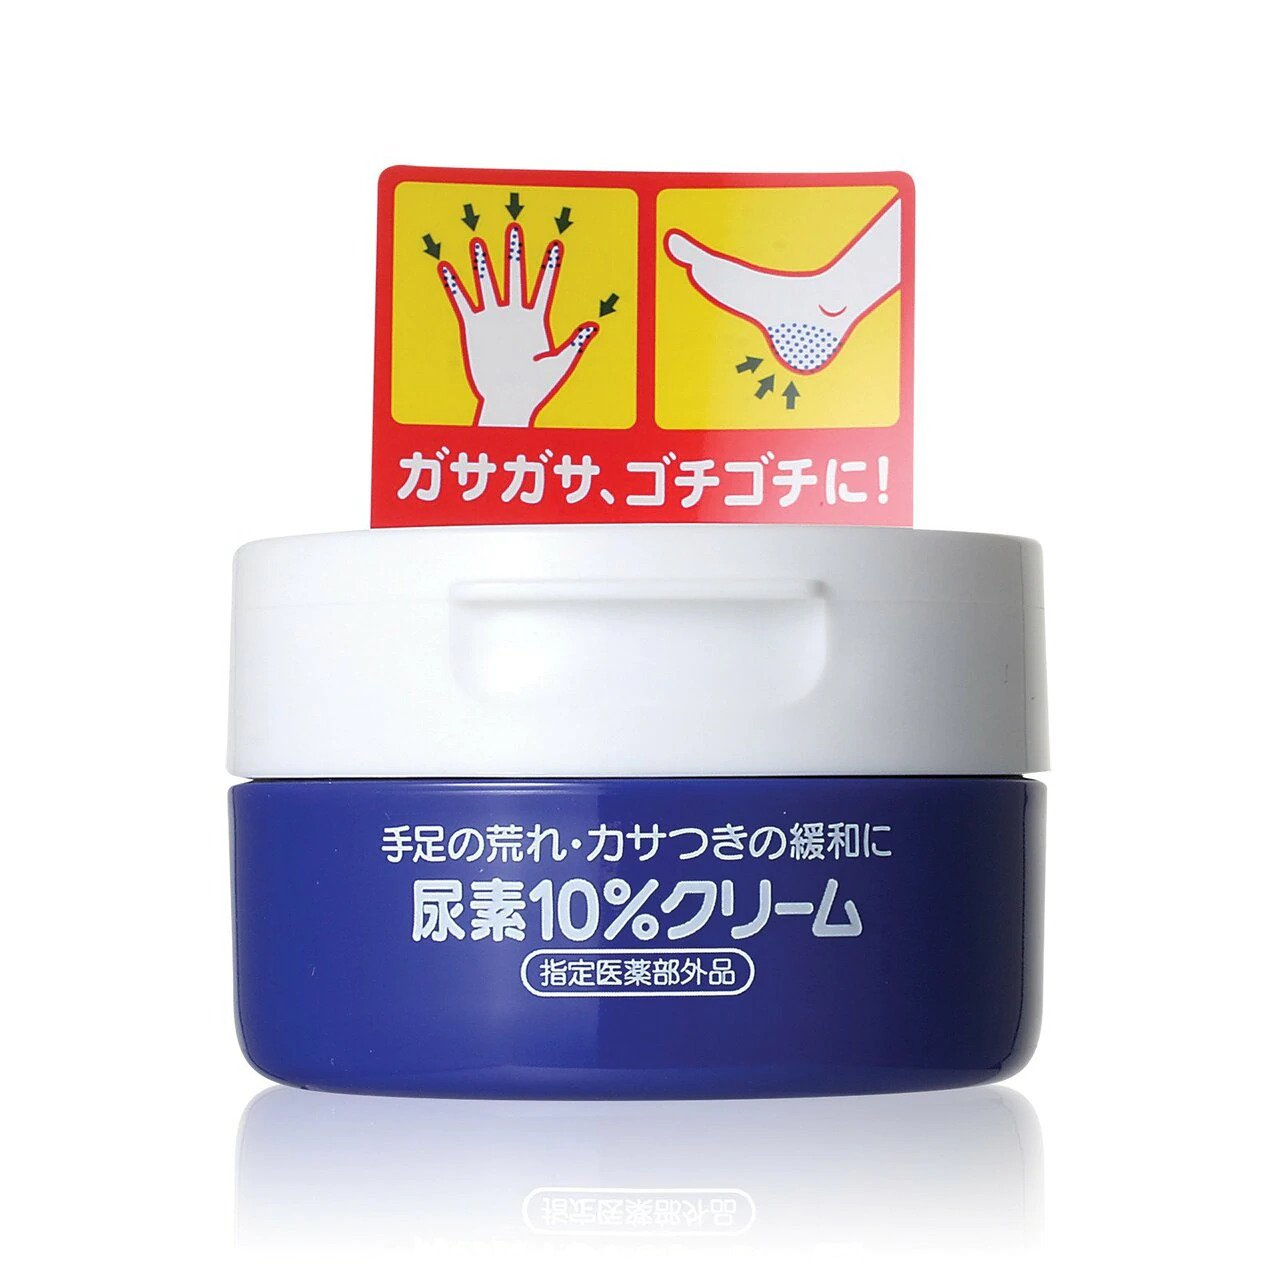 Shiseido Urea 10% Hand Cream